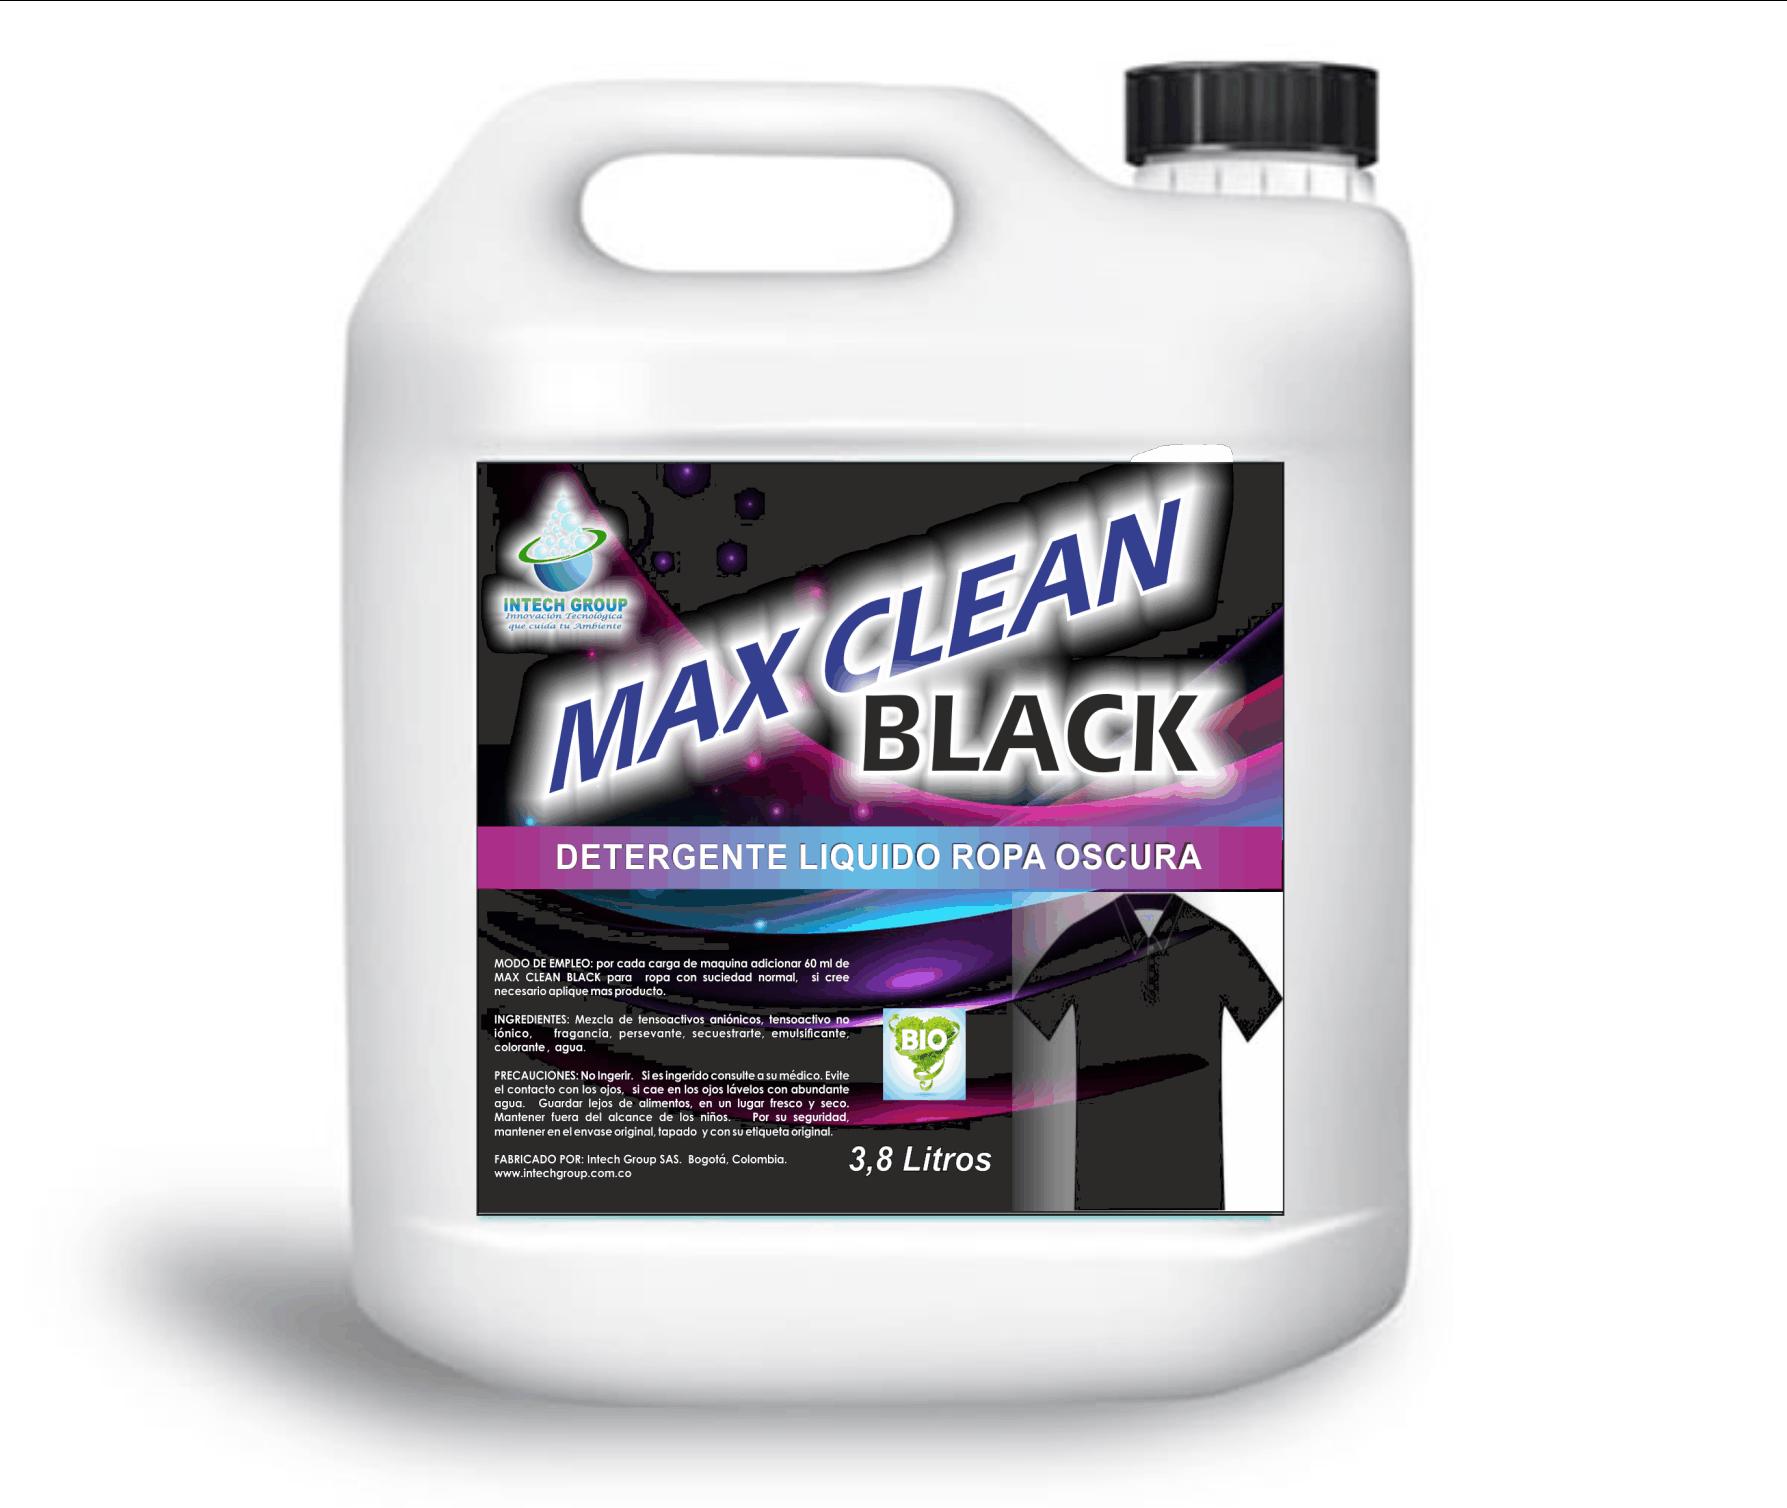 Detergente Ropa delicada